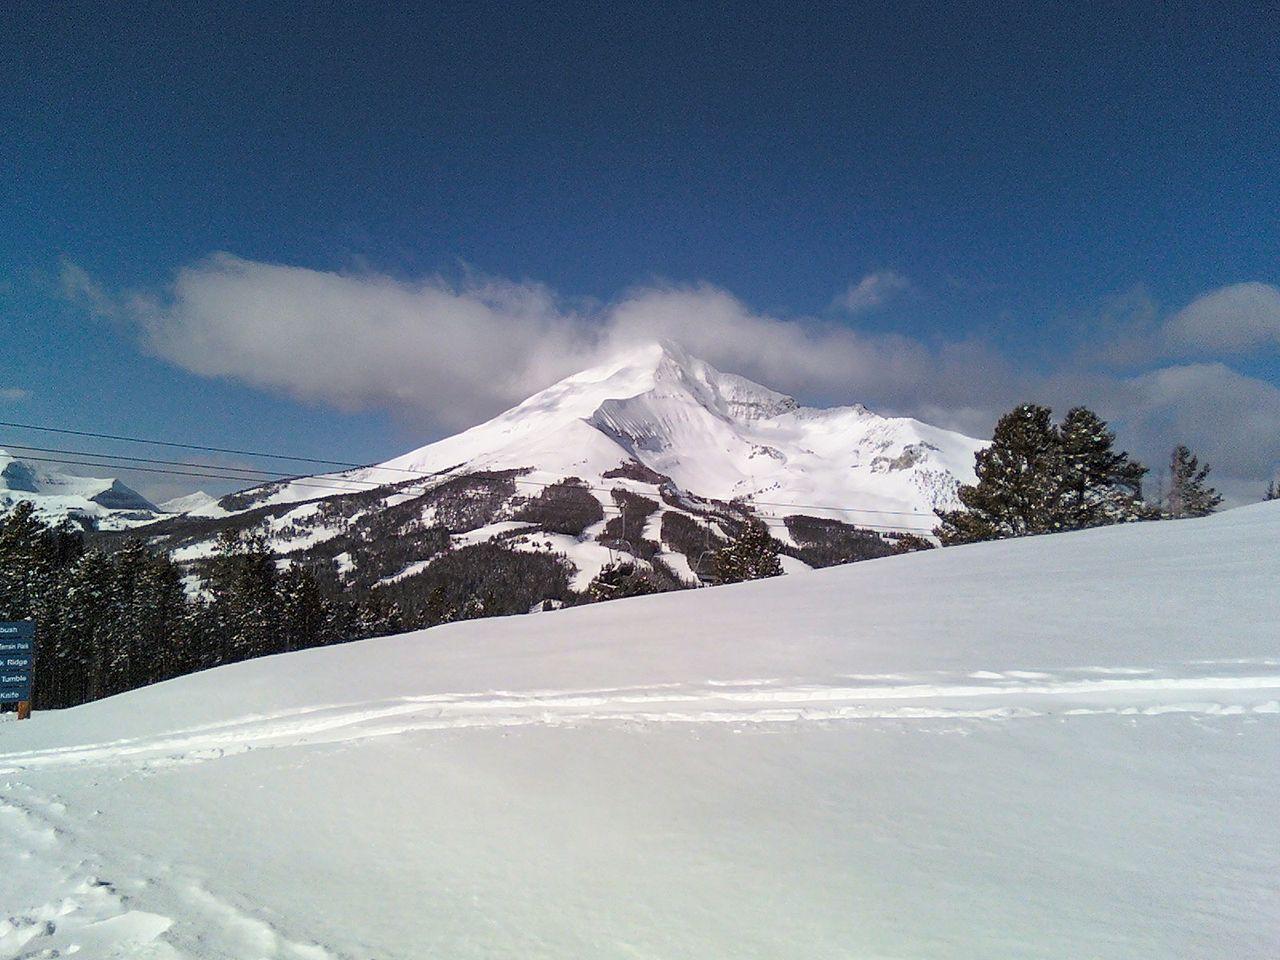 1280px-Lone_Peak,_Big_Sky,_Montana